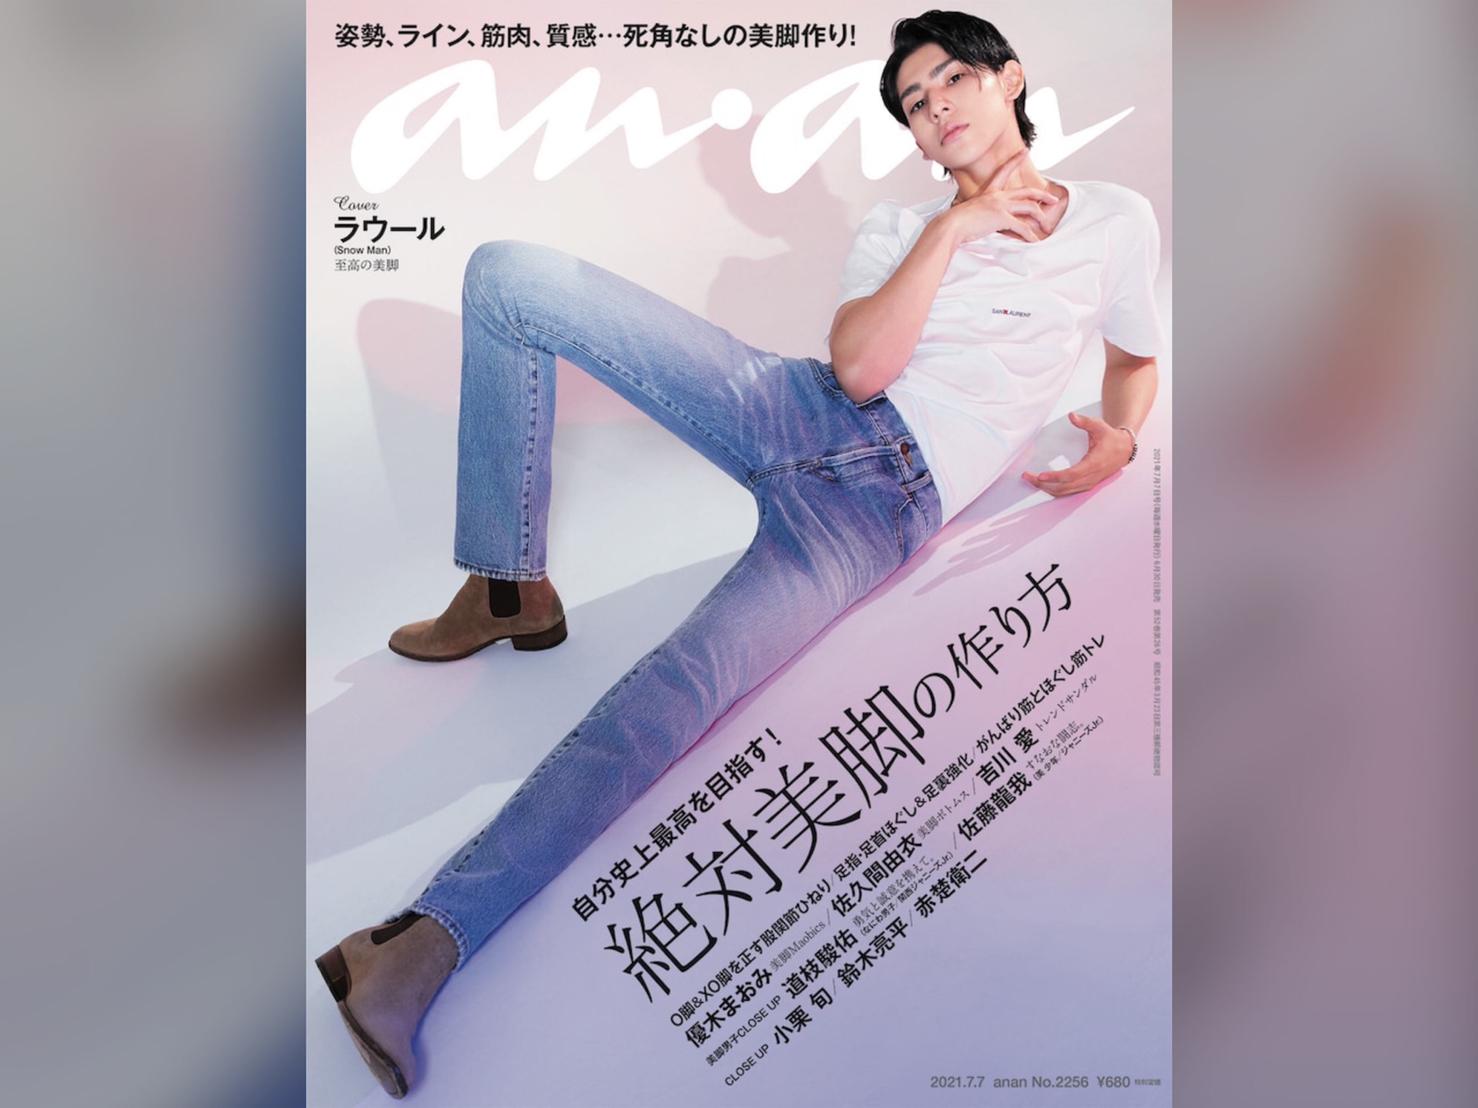 Snow Man・Raul首次上anan封面 展現壓倒性對角長腿姿勢